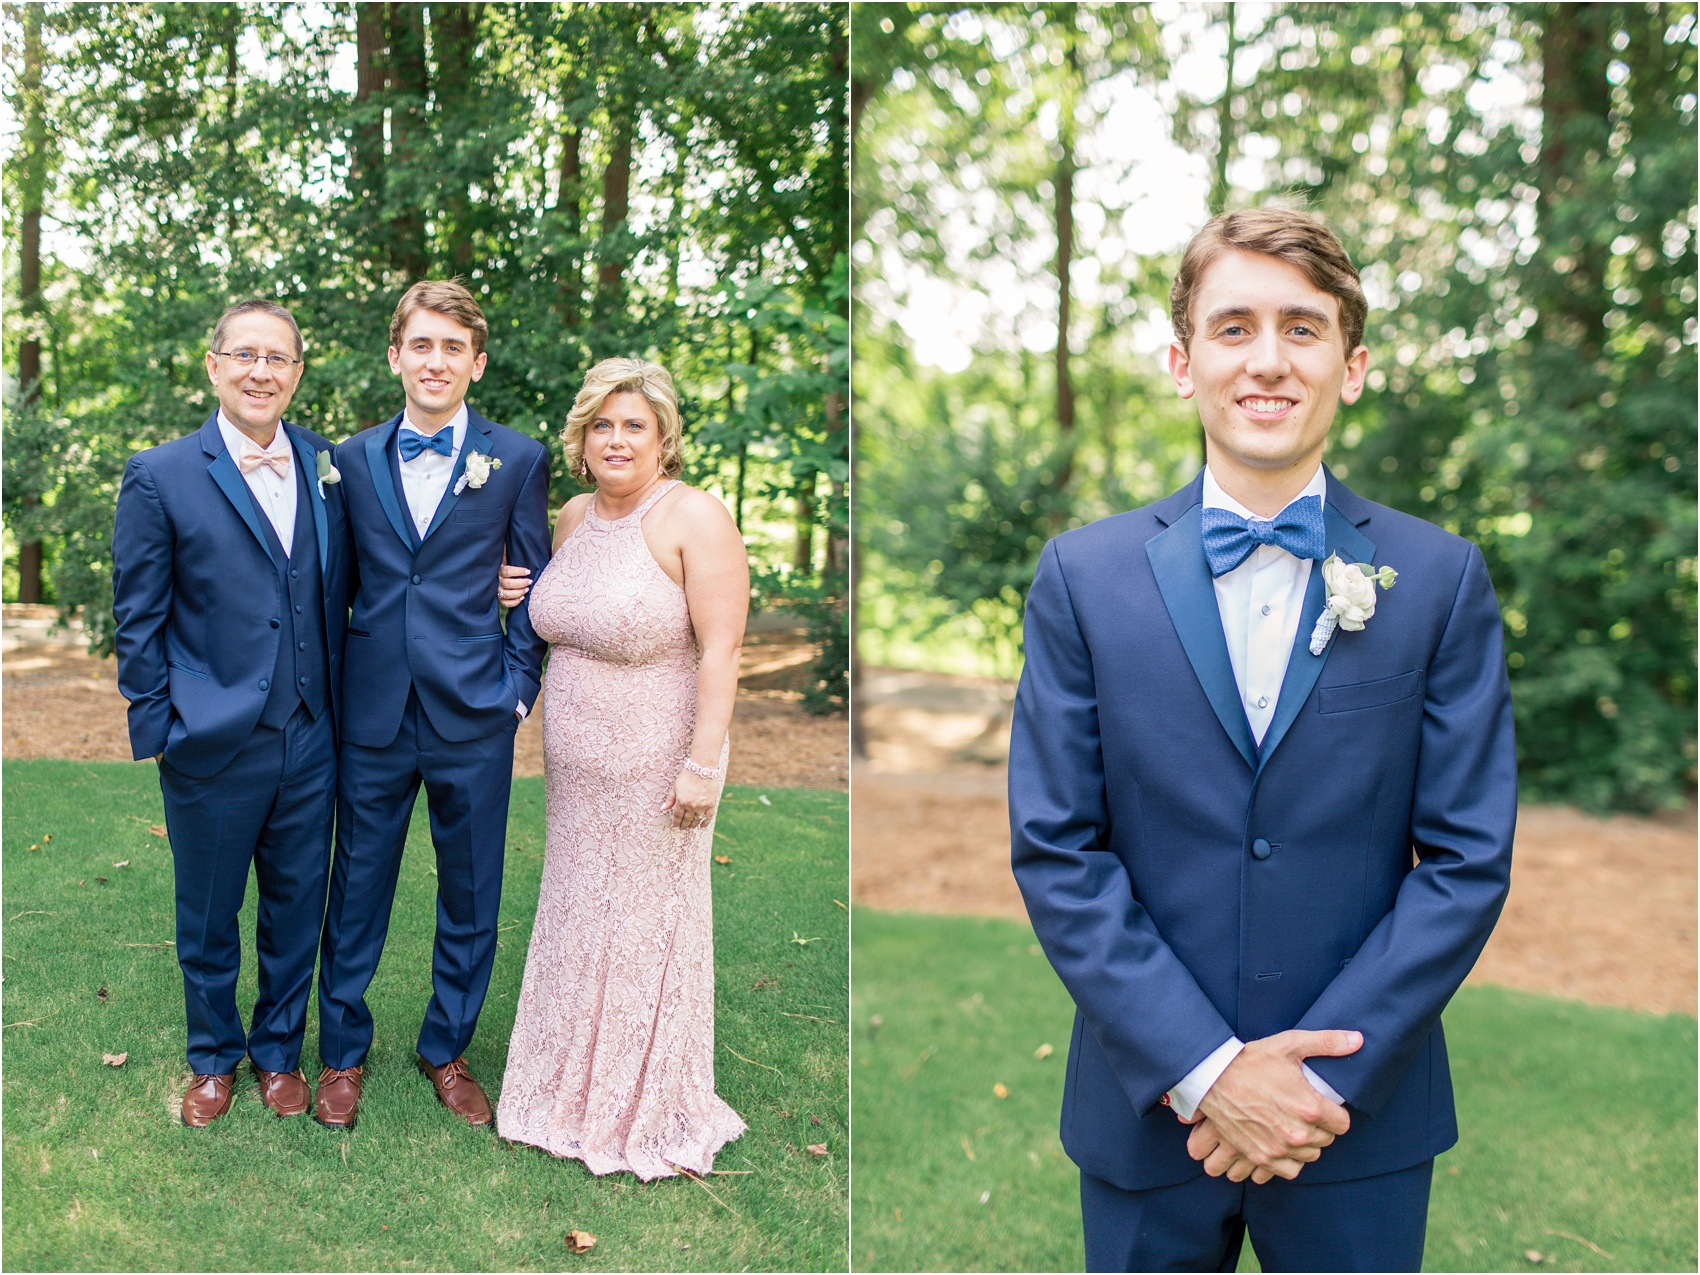 Savannah Eve Photography- Sigl-Adams Wedding- Sneak Peek-22.jpg